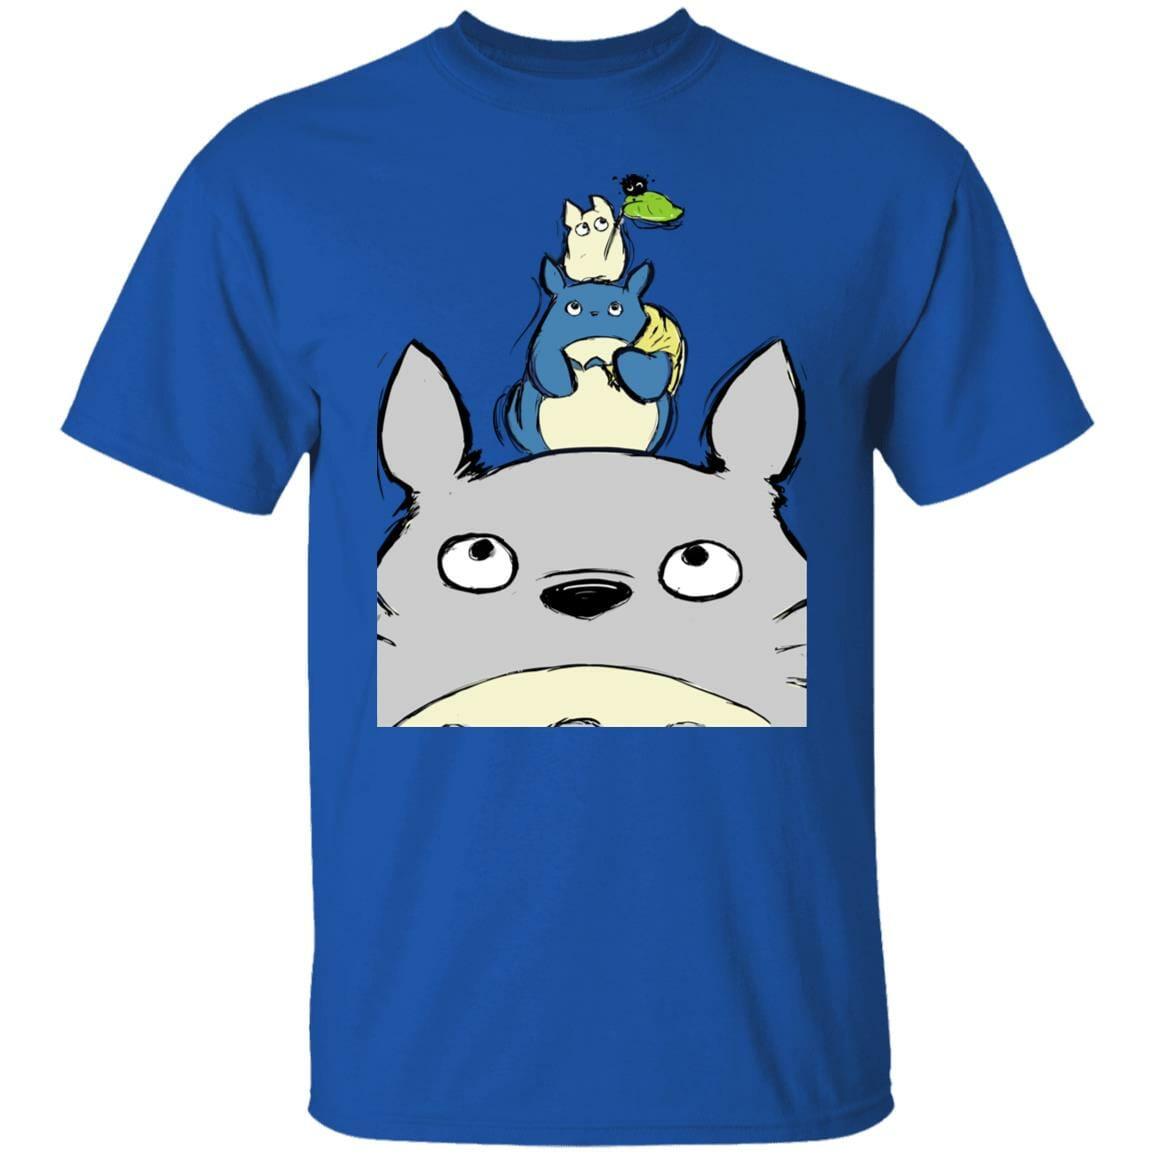 Totoro Family T Shirt